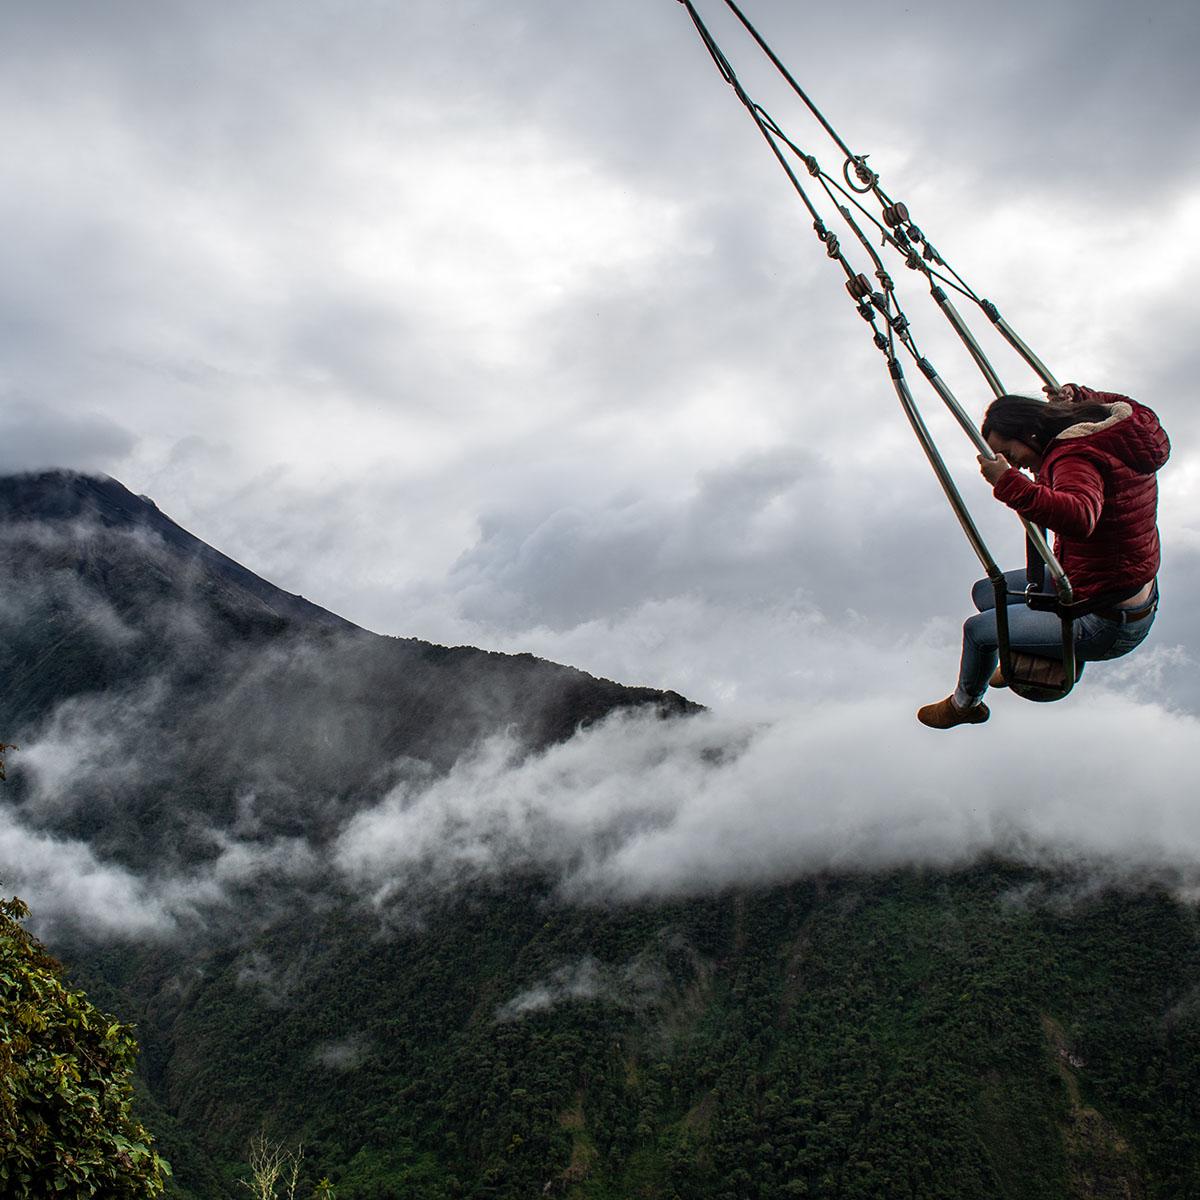 Countries Welcoming Vaccinated Tourists - Ecuador